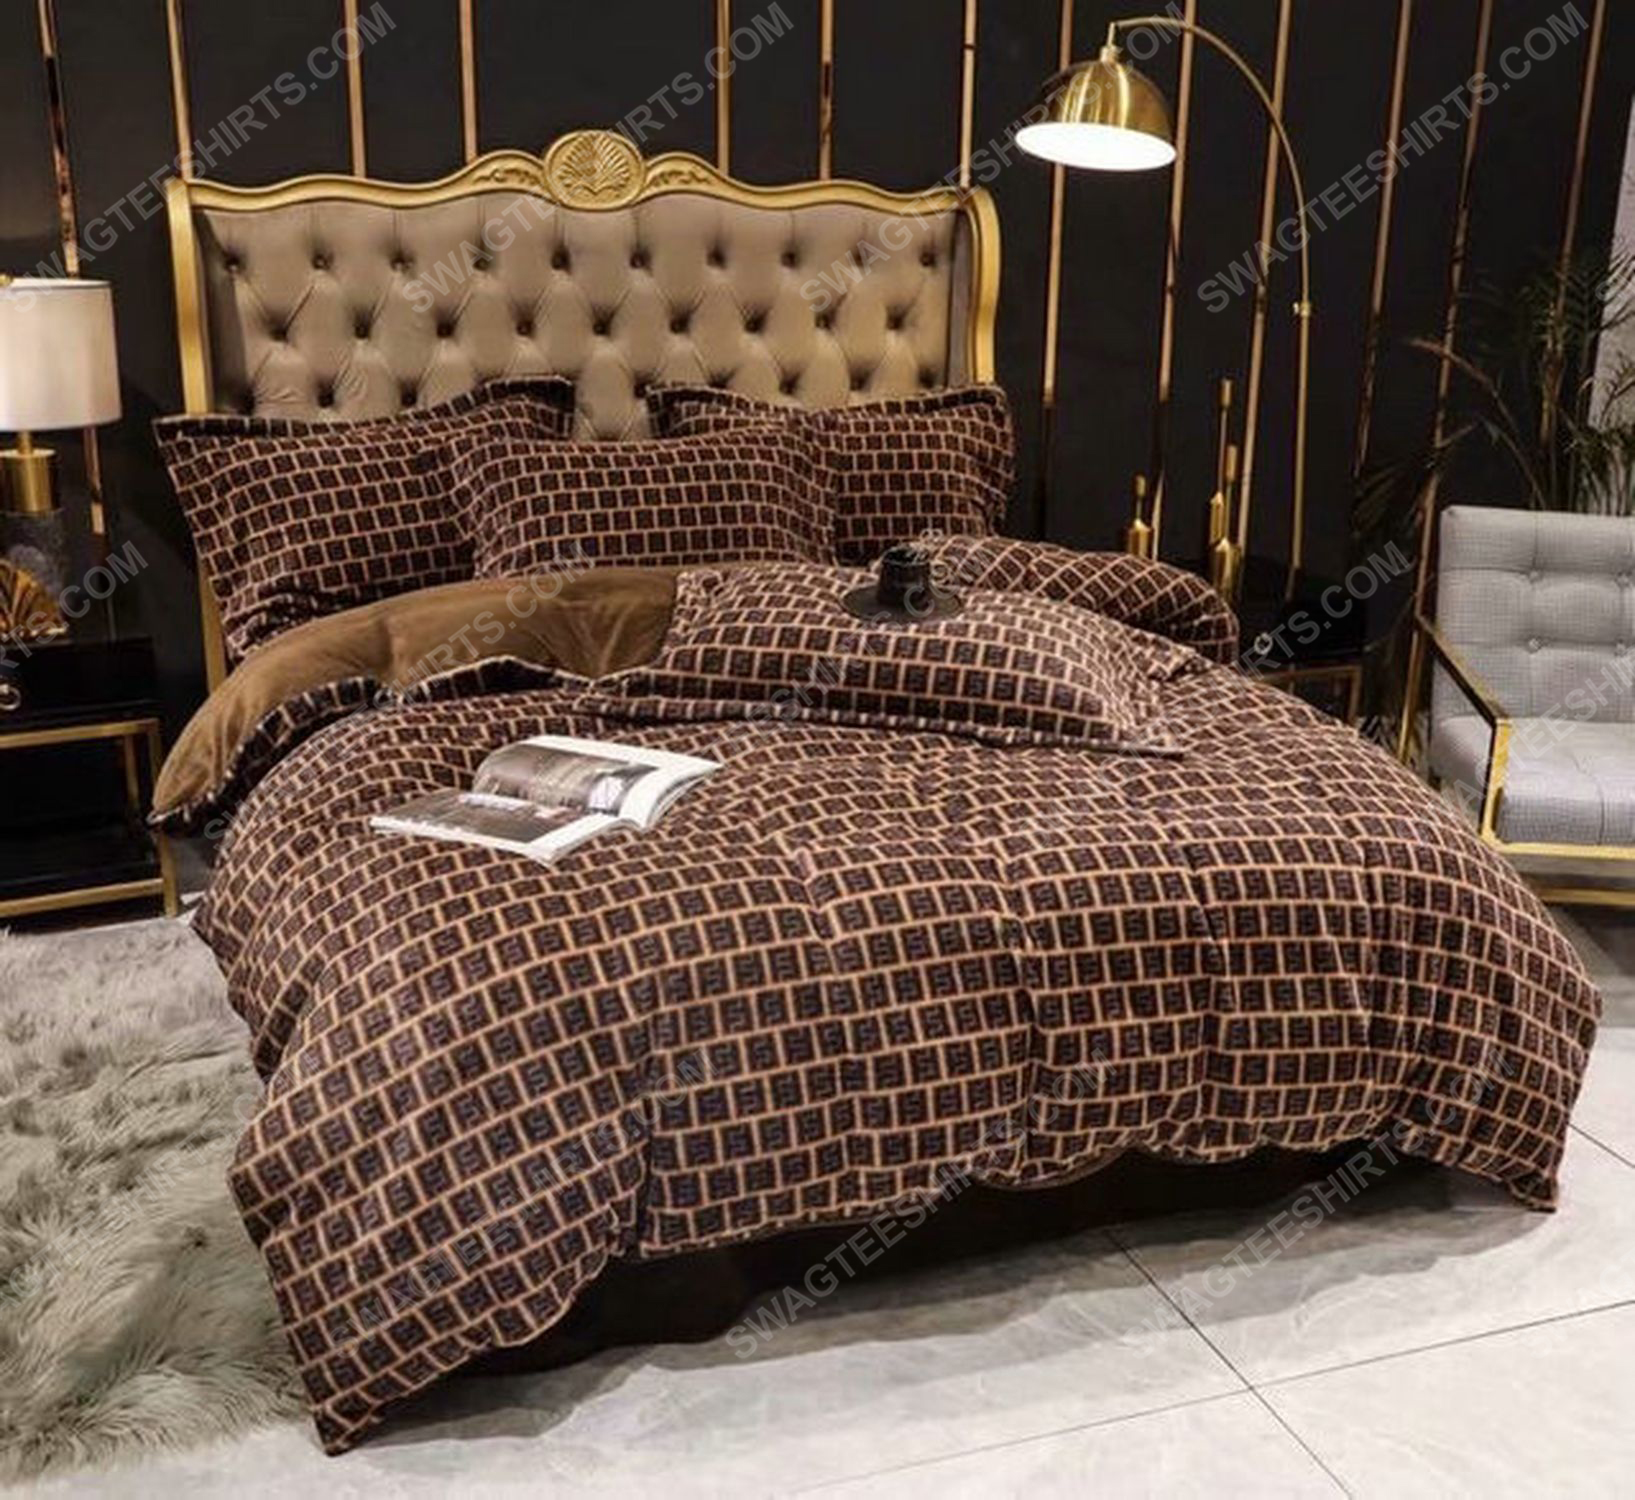 Fendi monogram symbols full print duvet cover bedding set 3 - Copy